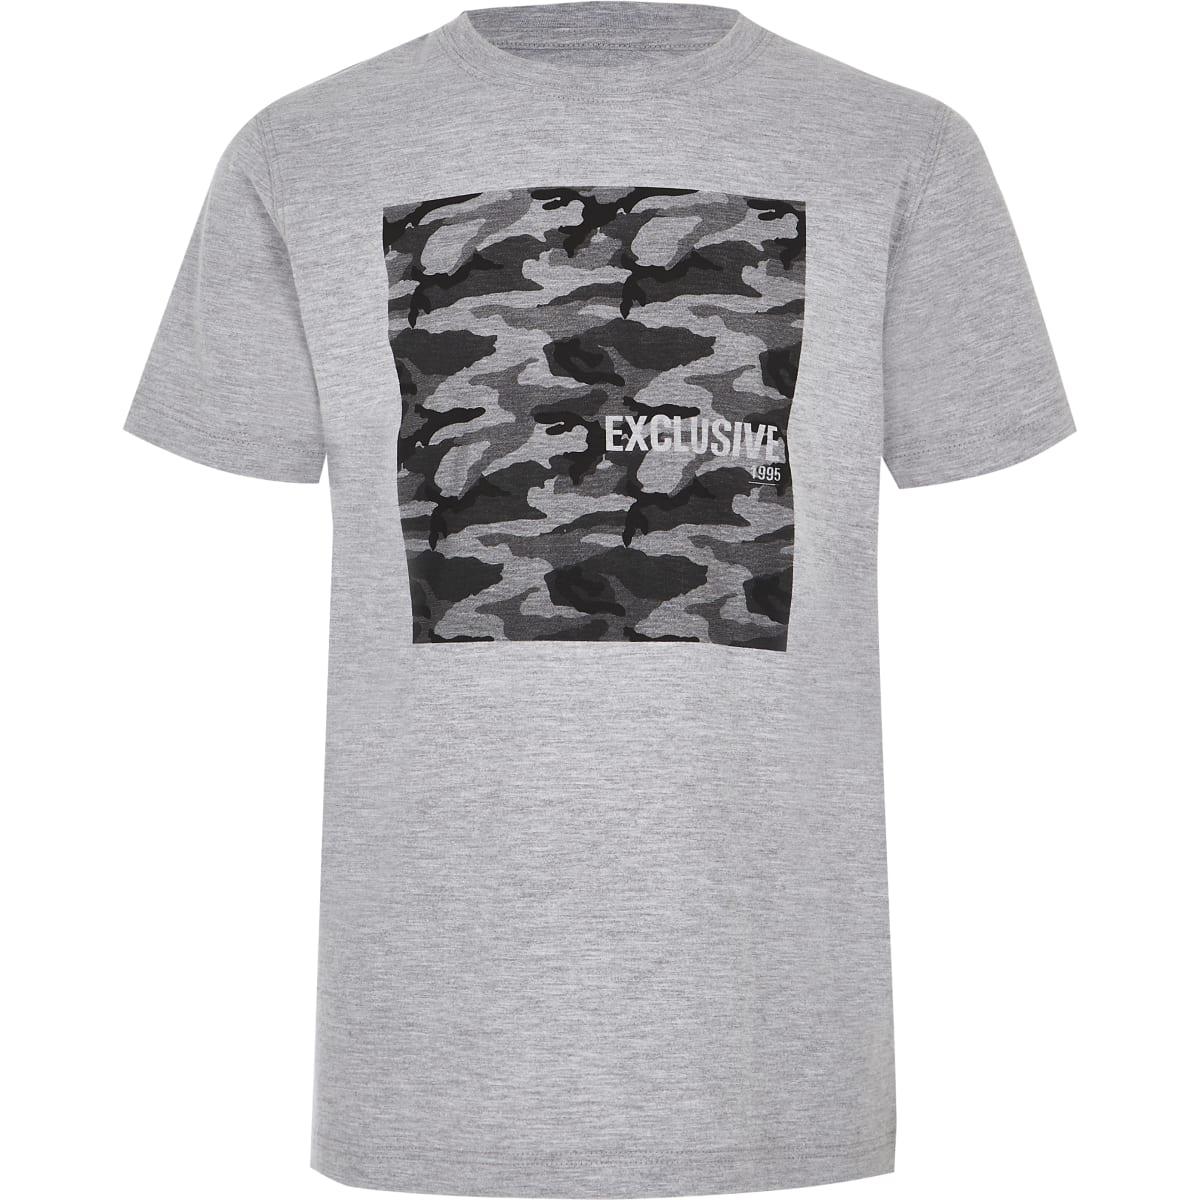 Boys grey camo T-shirt